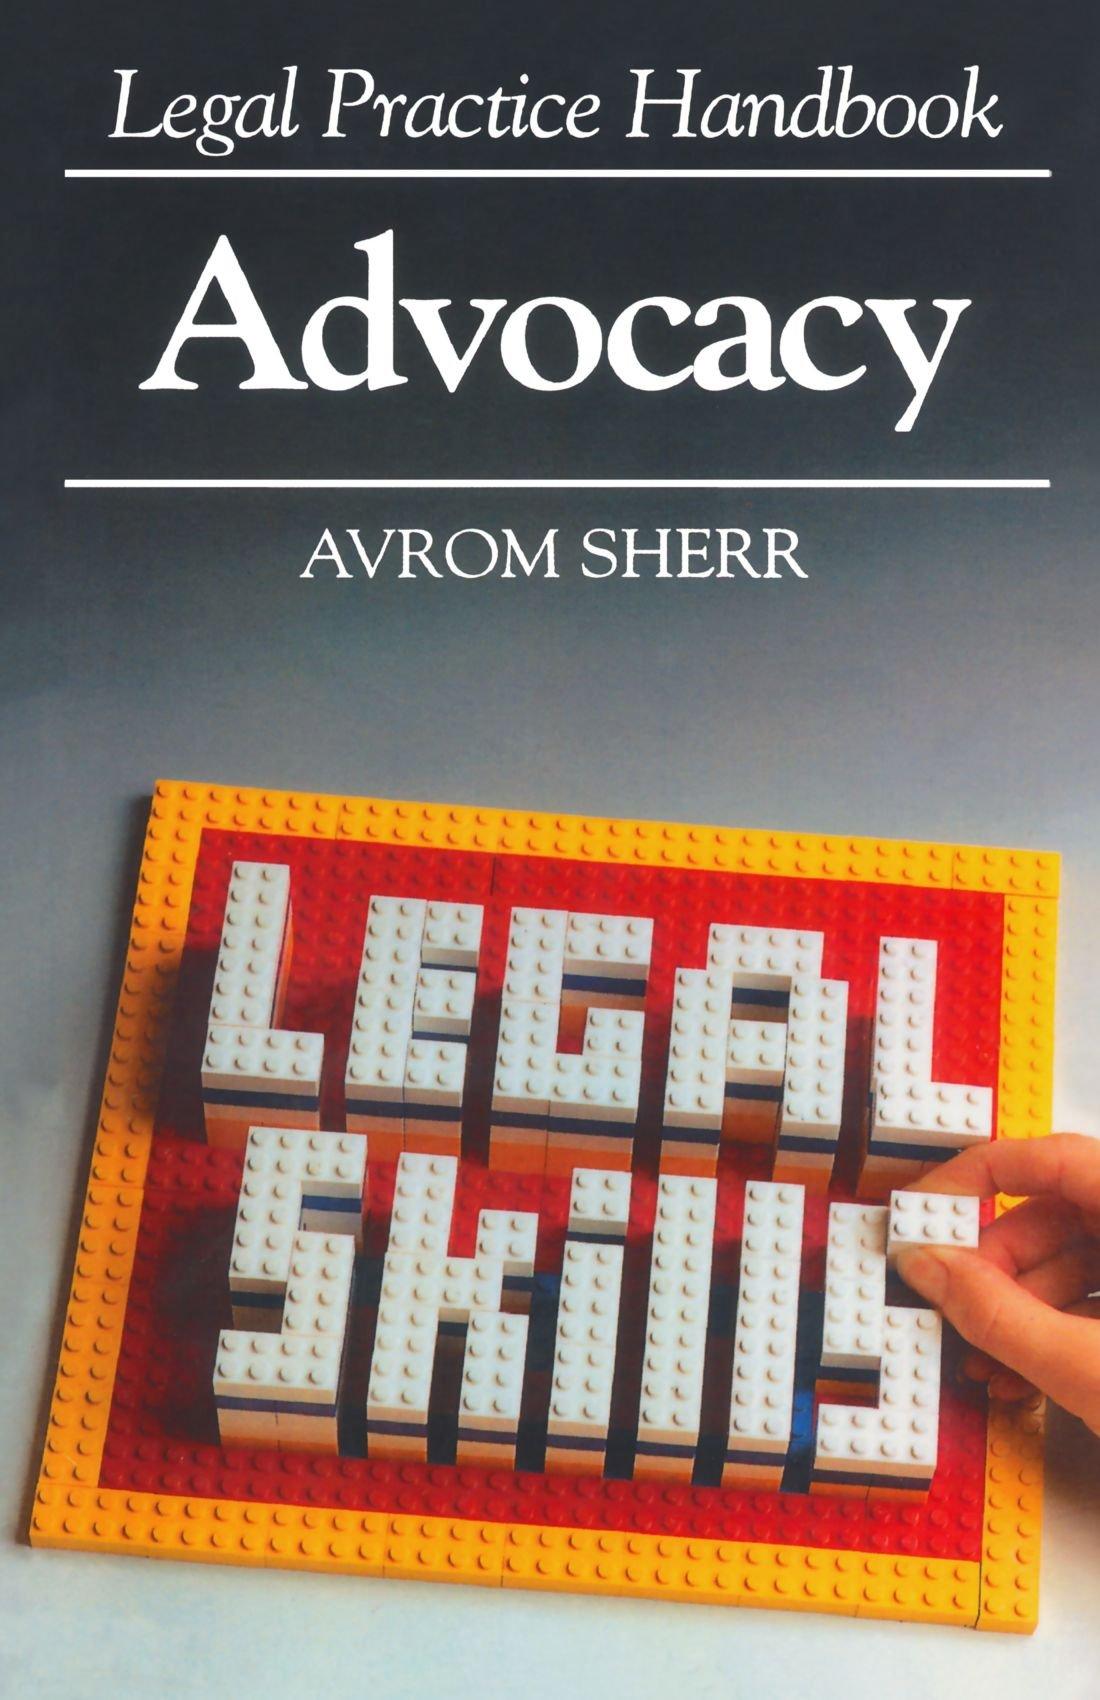 Advocacy (Legal Practice Handbooks) ebook